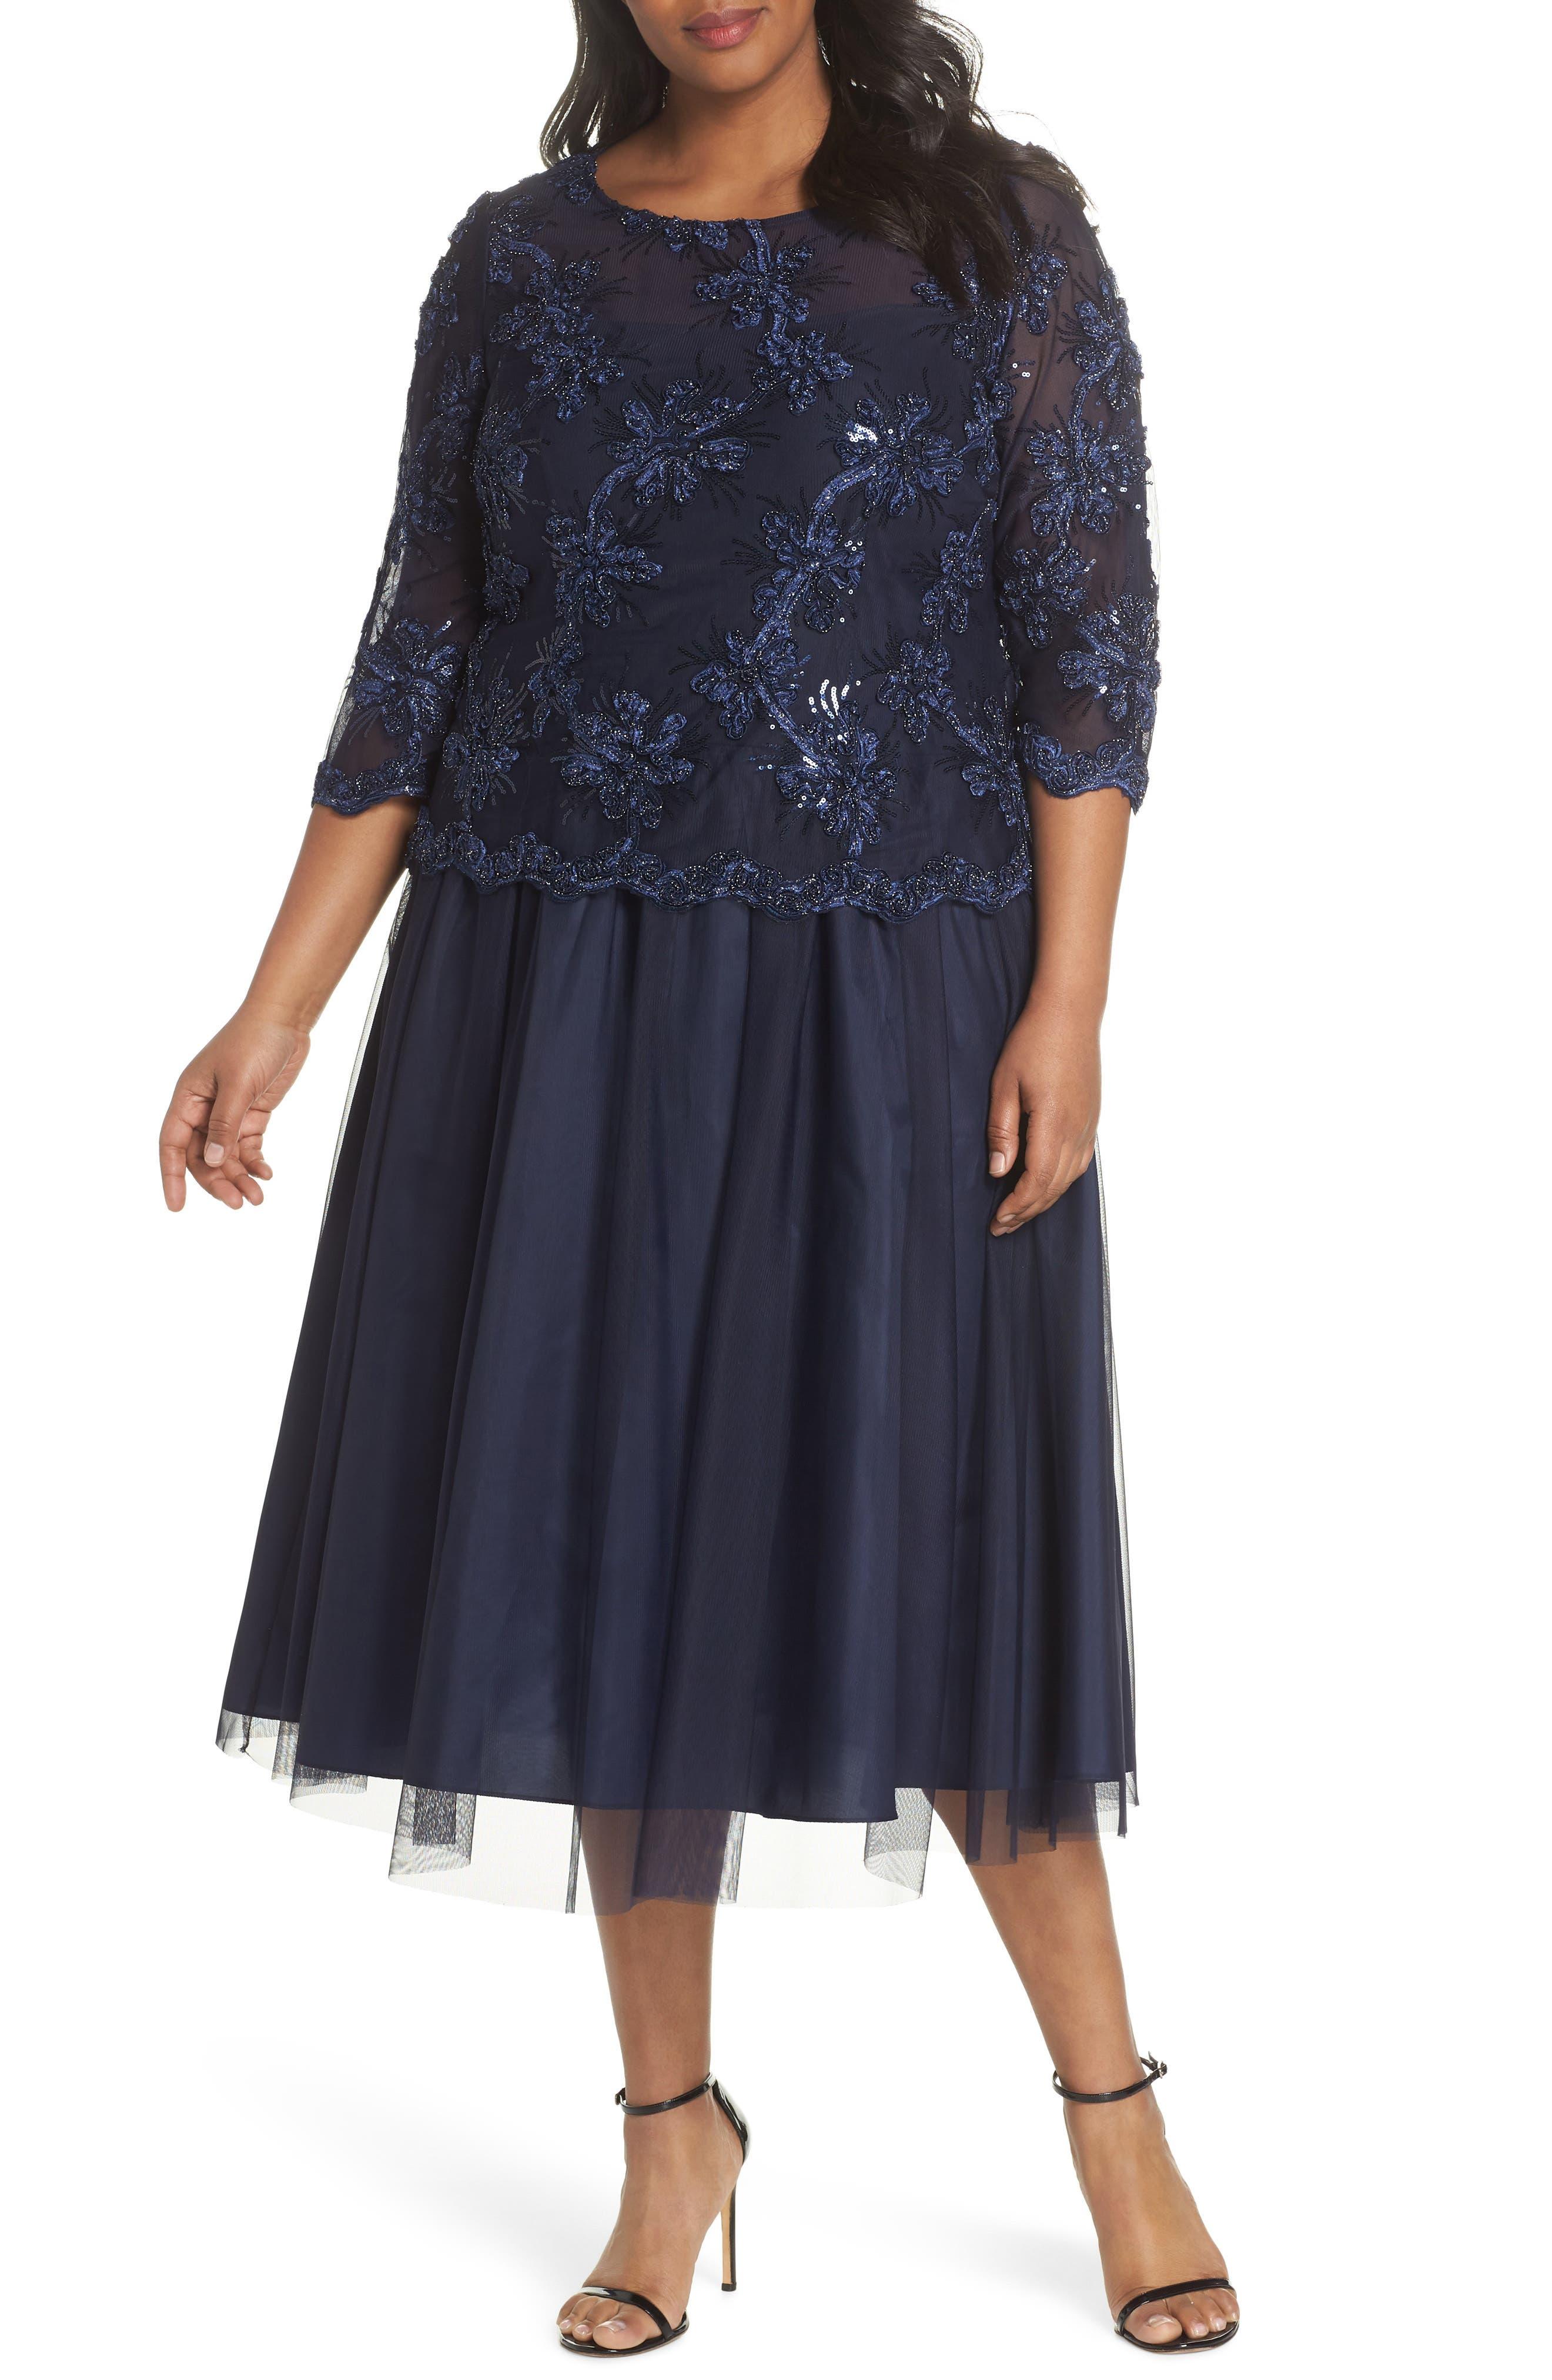 Embellished Bodice Tea Length Mesh Dress,                             Main thumbnail 1, color,                             410